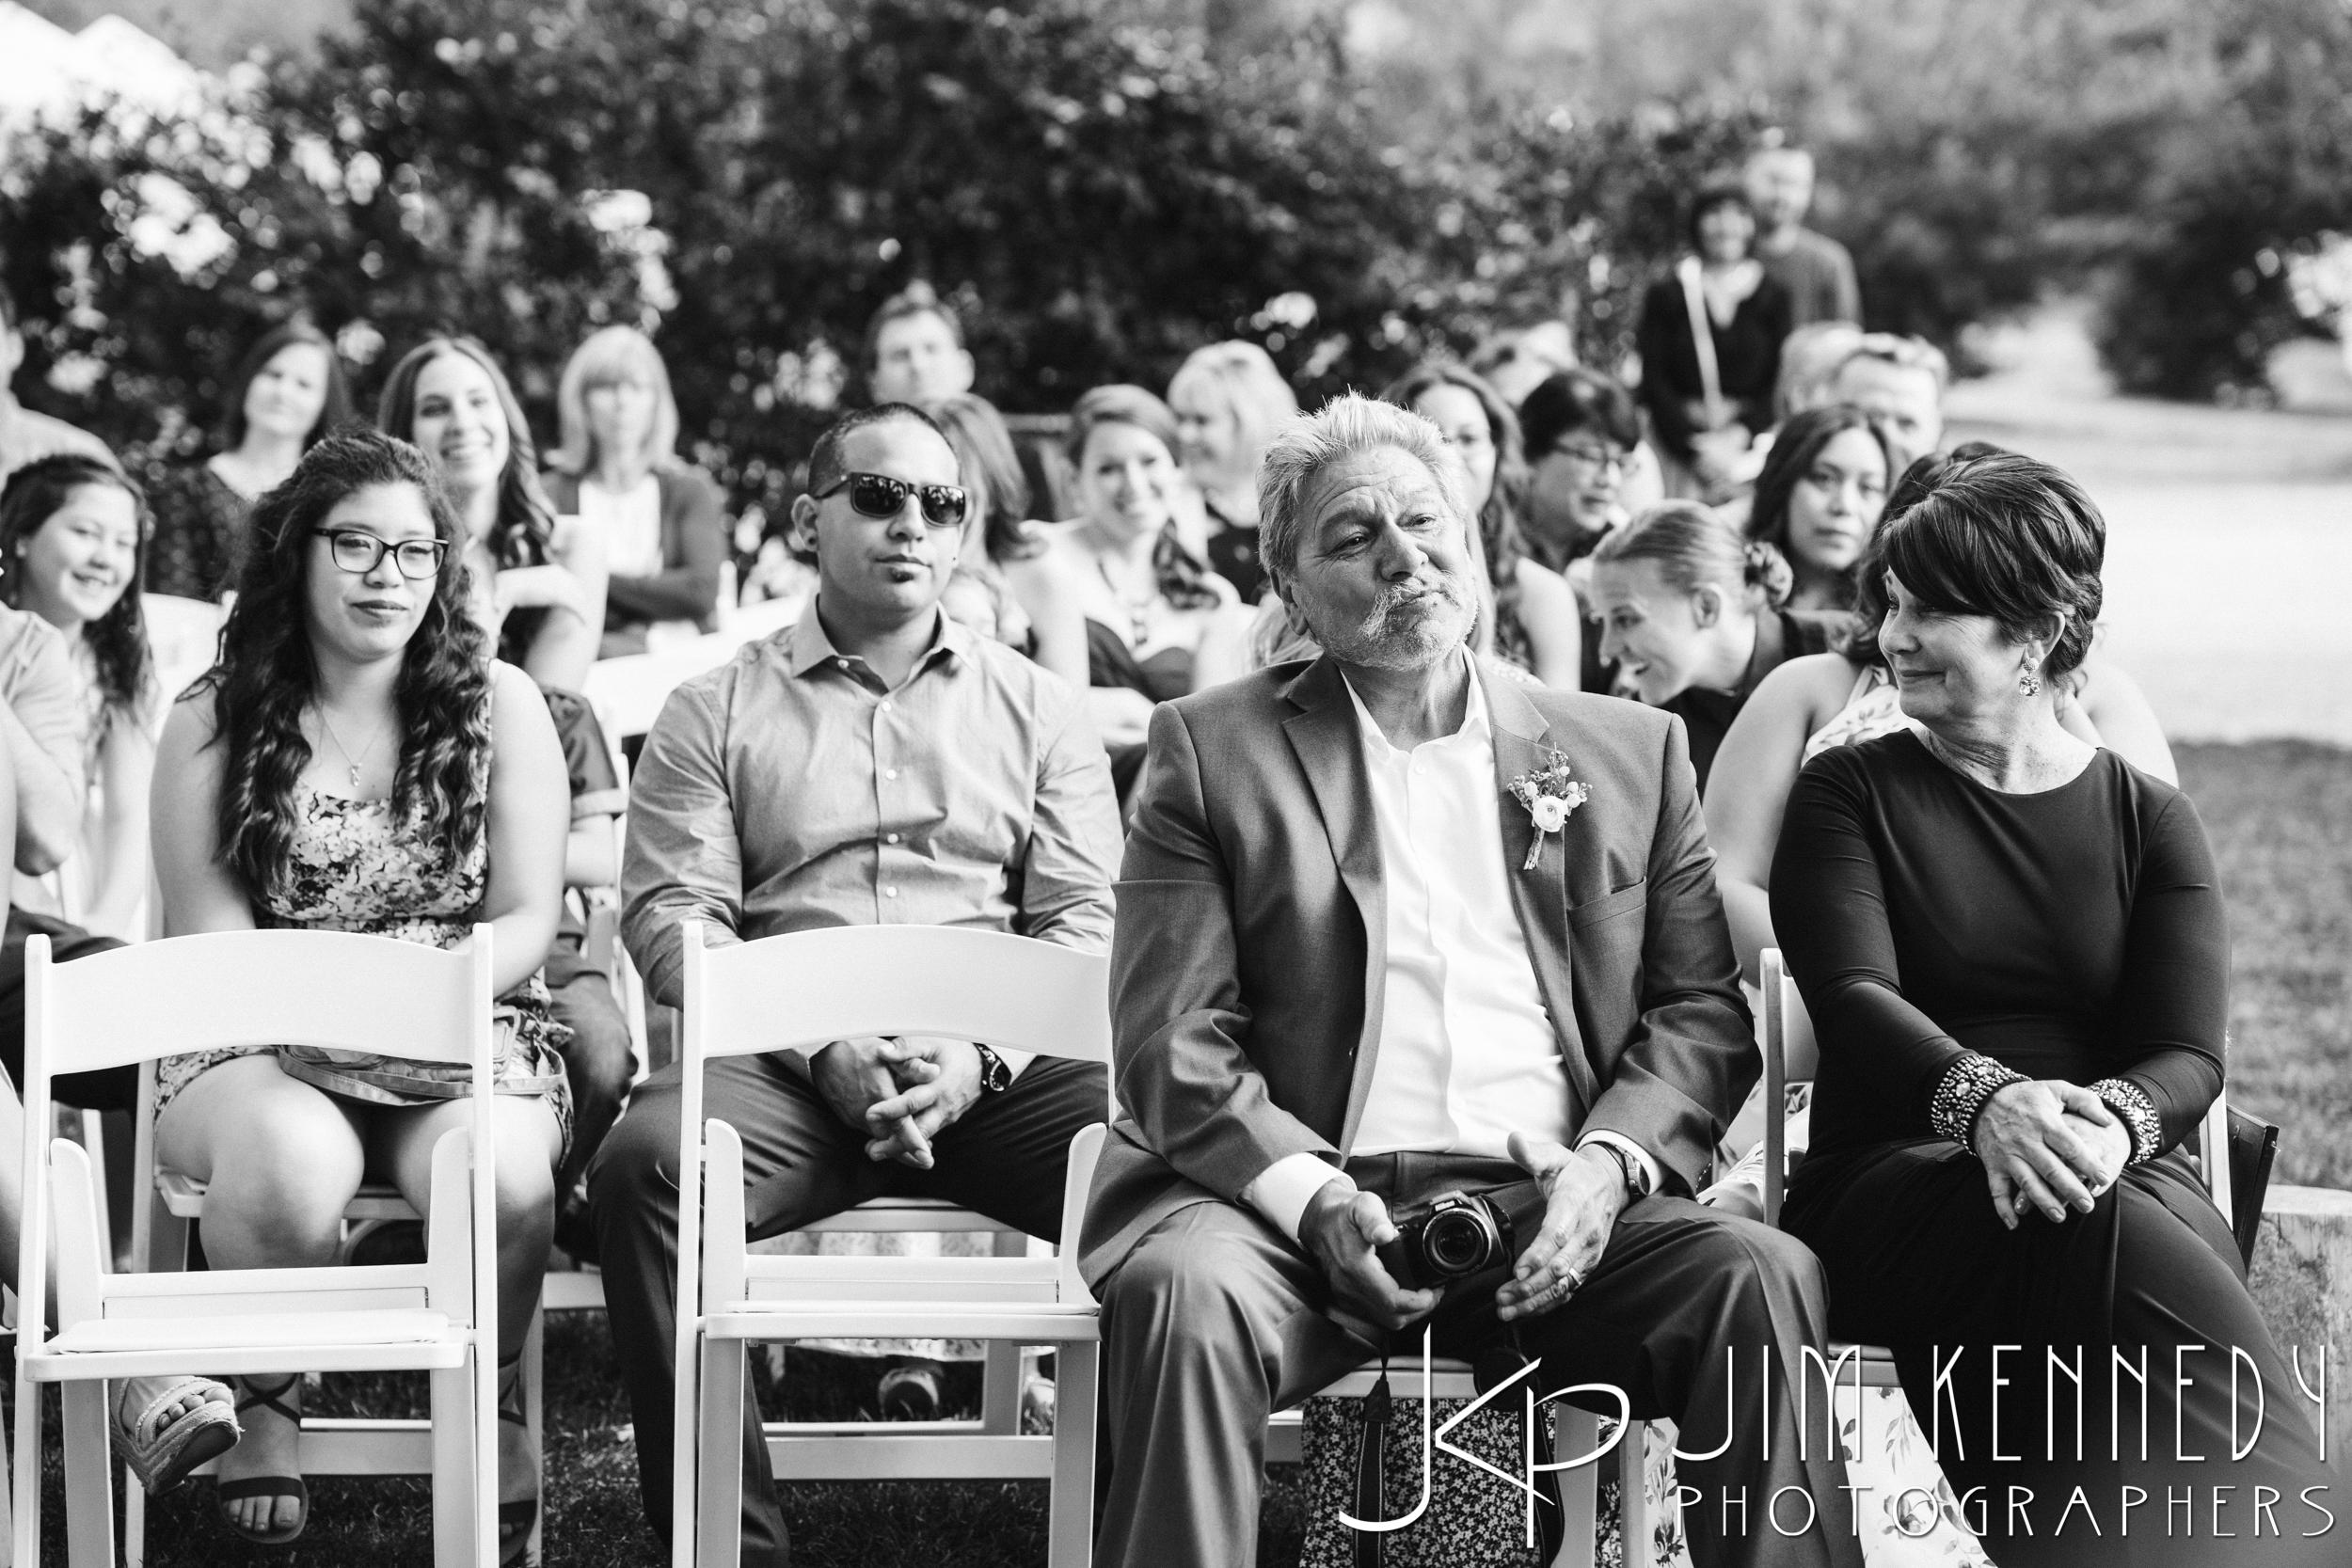 jim_kennedy_photographers_highland_springs_wedding_caitlyn_0116.jpg